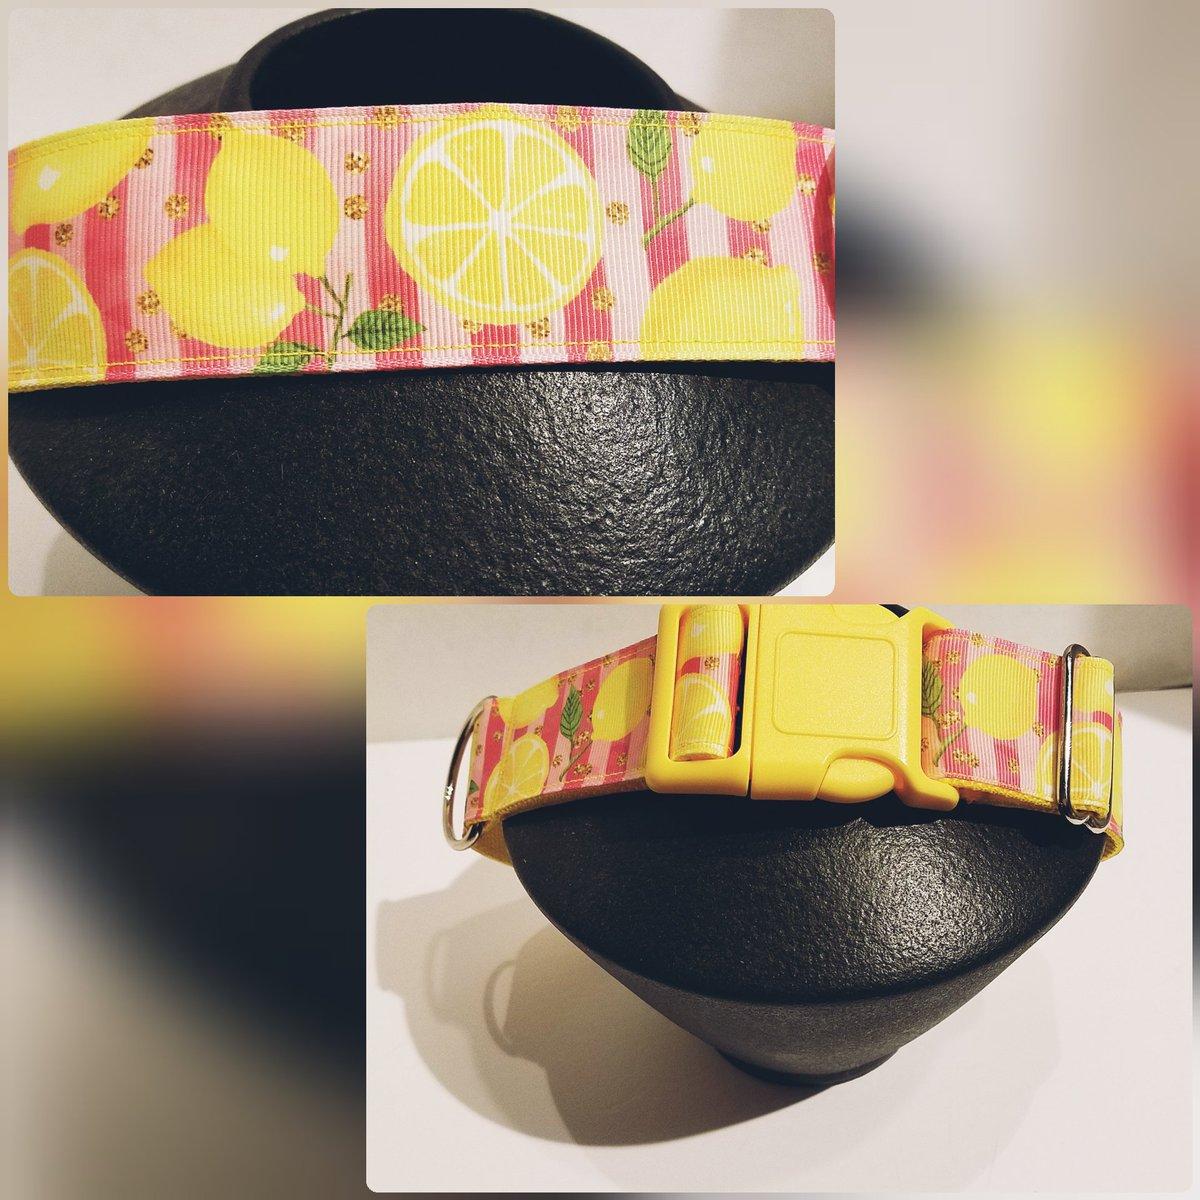 What a fun #Lemon #Dog collar!! 🍋#dogs #fruits #etsypreneur #epiconetsy #craftshout #MondayMorning #mondaythoughts #womeninbiz